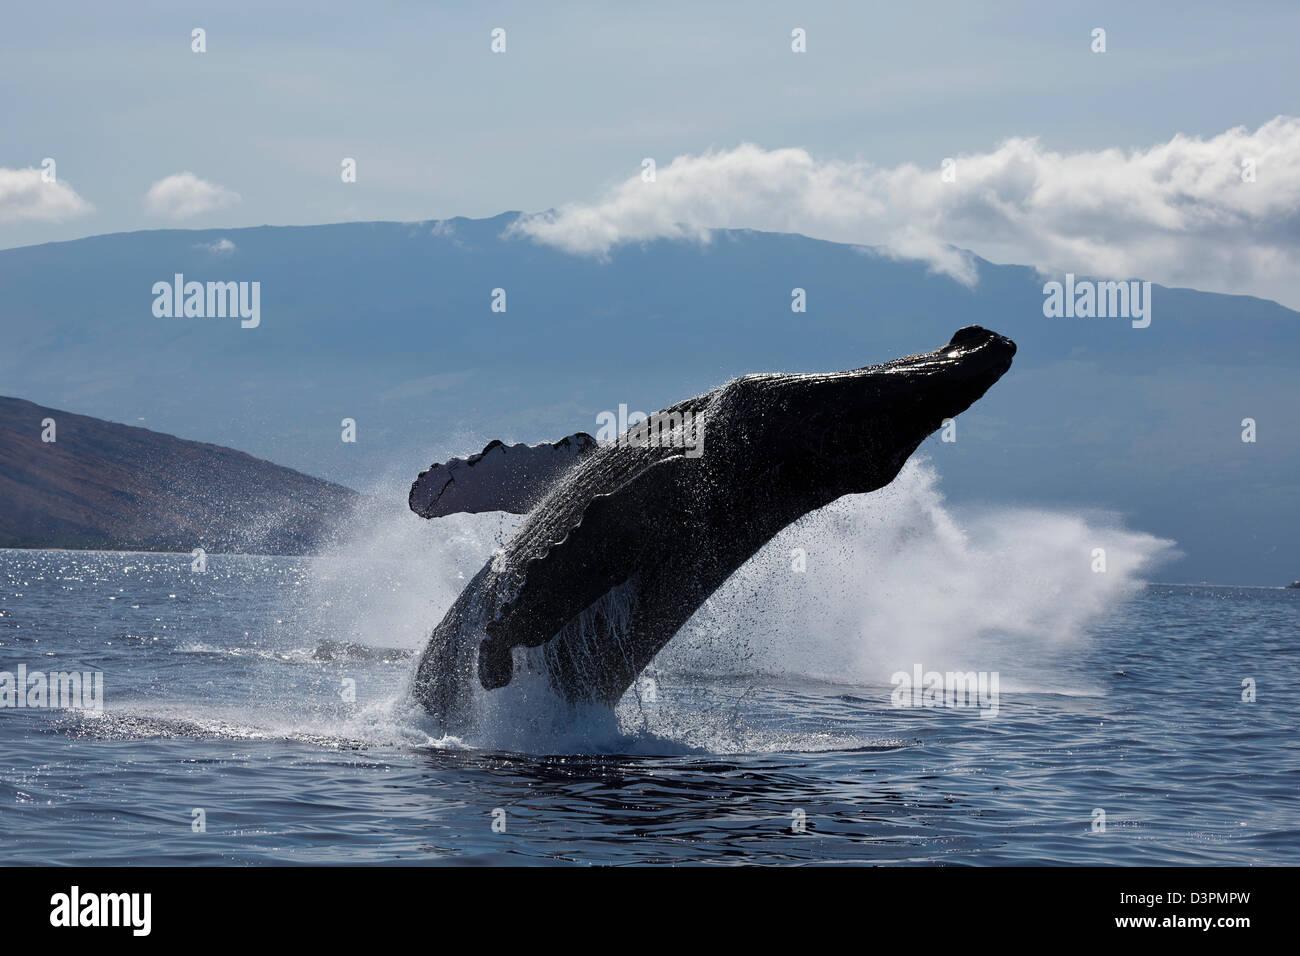 Breaching humpback whale, Megaptera novaeangliae, with Haleakala in the background, Maui, Hawaii. - Stock Image